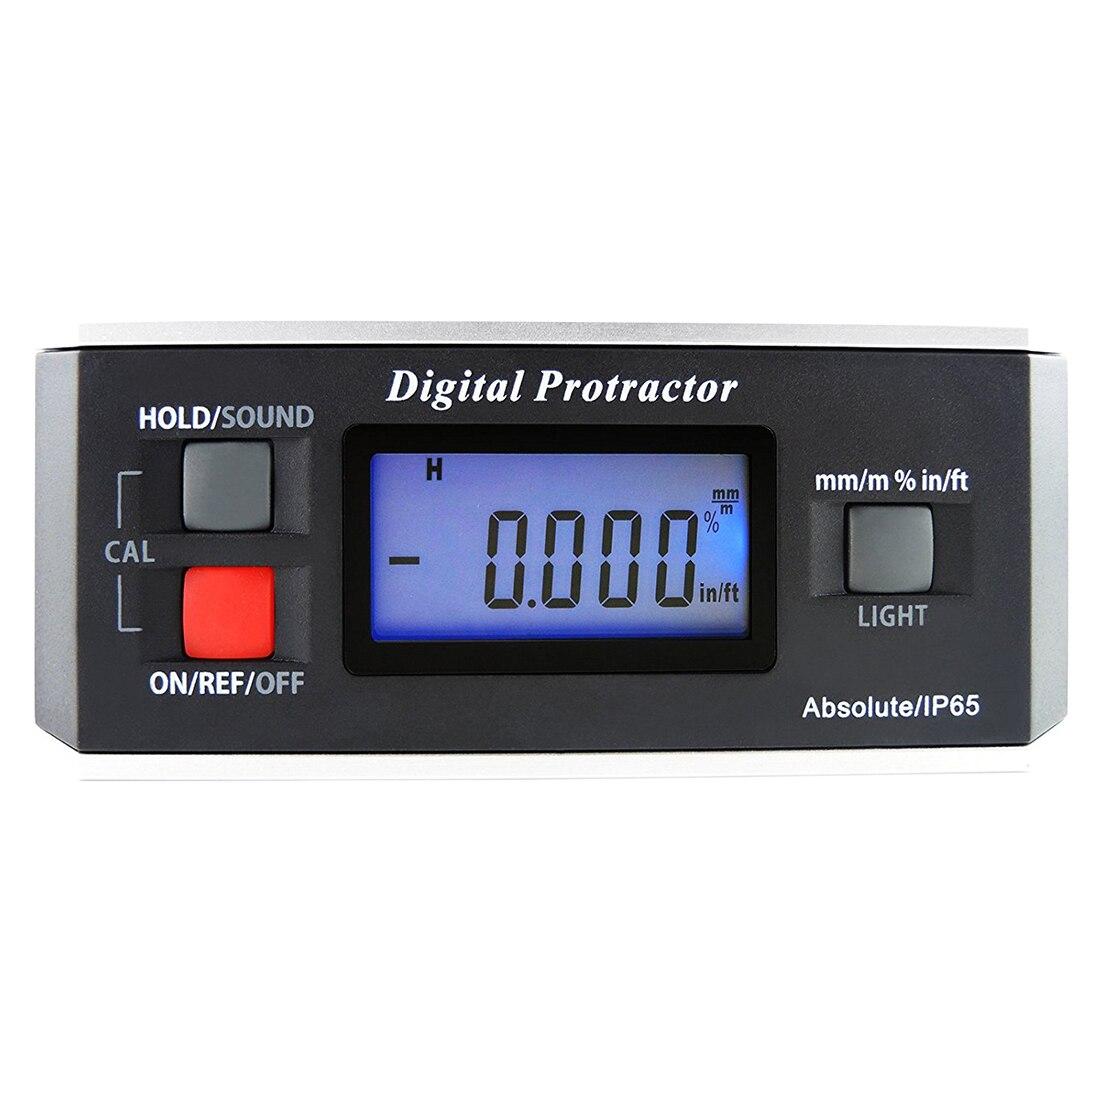 Practical Mini Digital Inclinometer,360 degree  Mini Digital Protractor Inclinometer Angle Meter with Base digital protractor inclinometer angle meter digital bevel box 4 x 90 degree range magnetic base